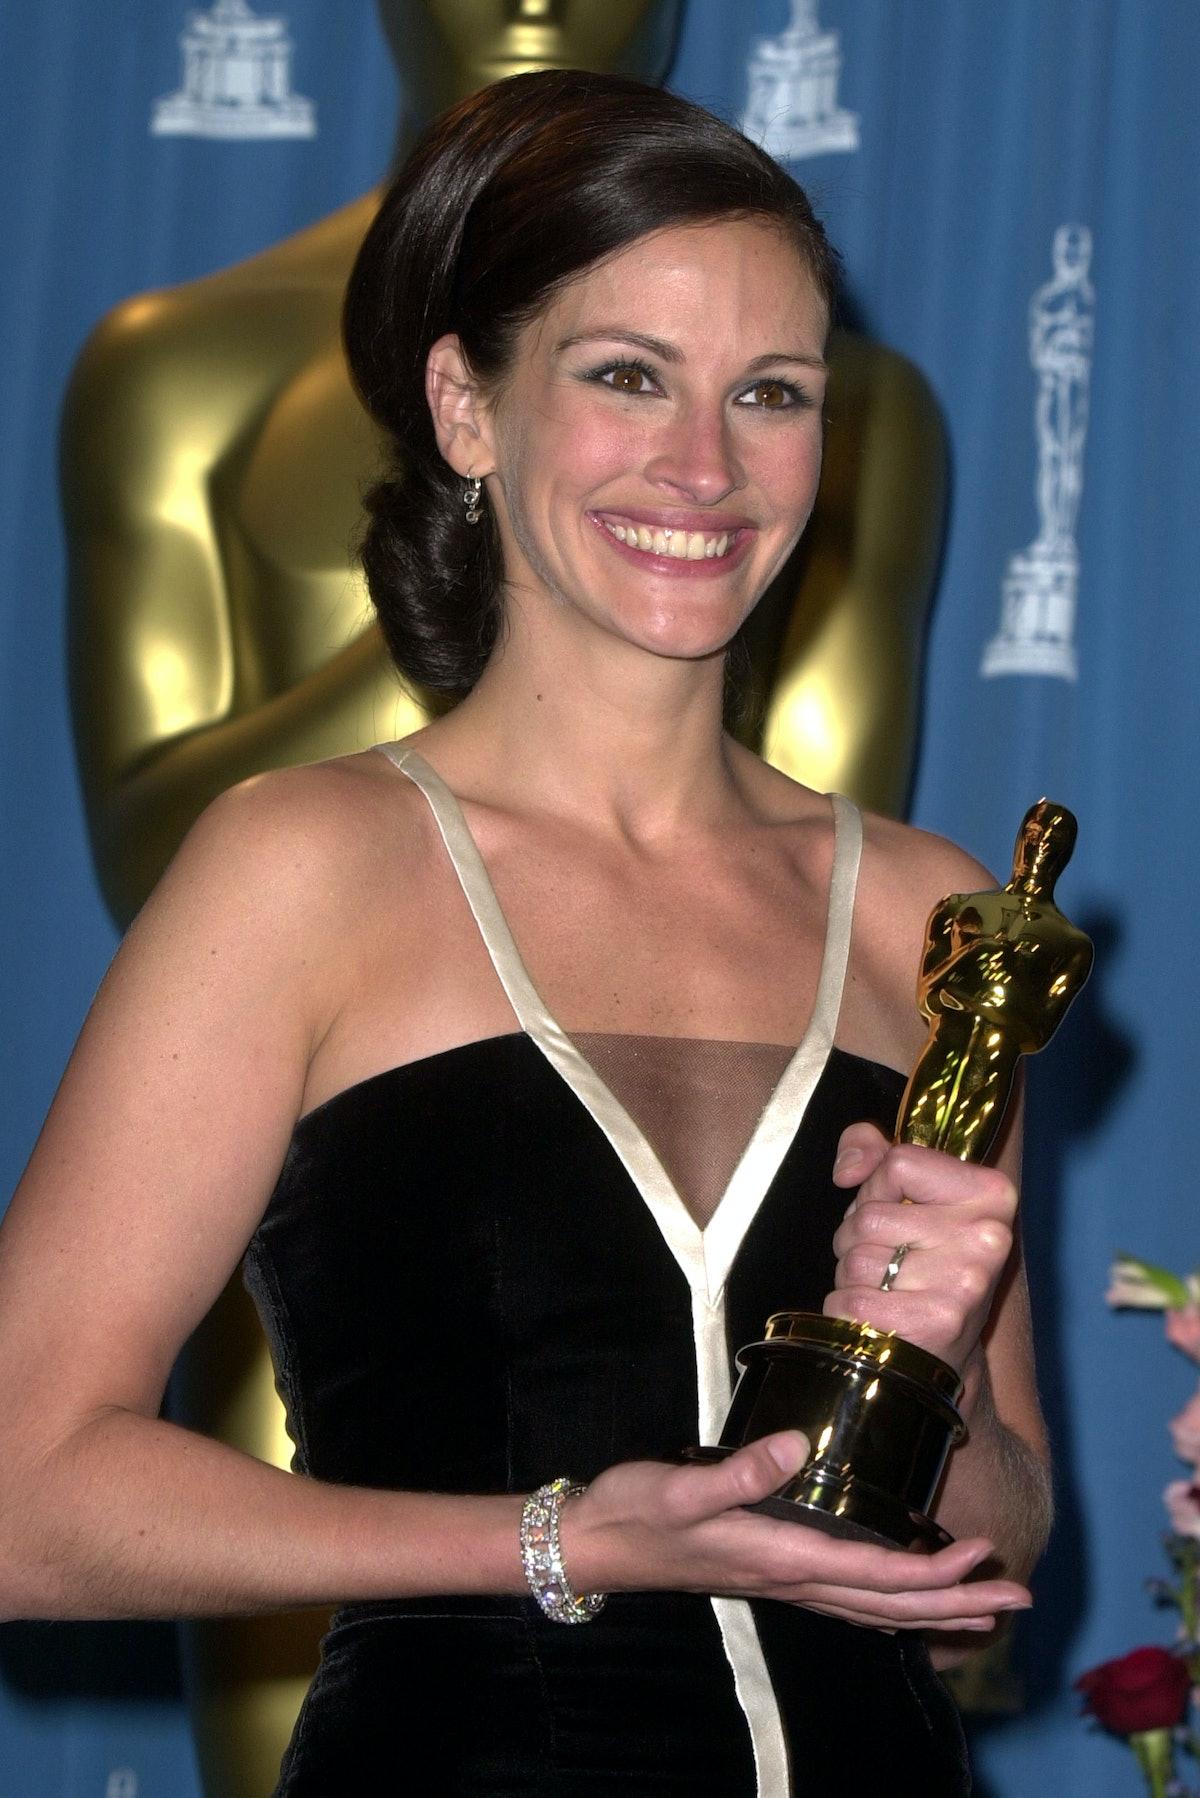 Julia Roberts holding an Oscar